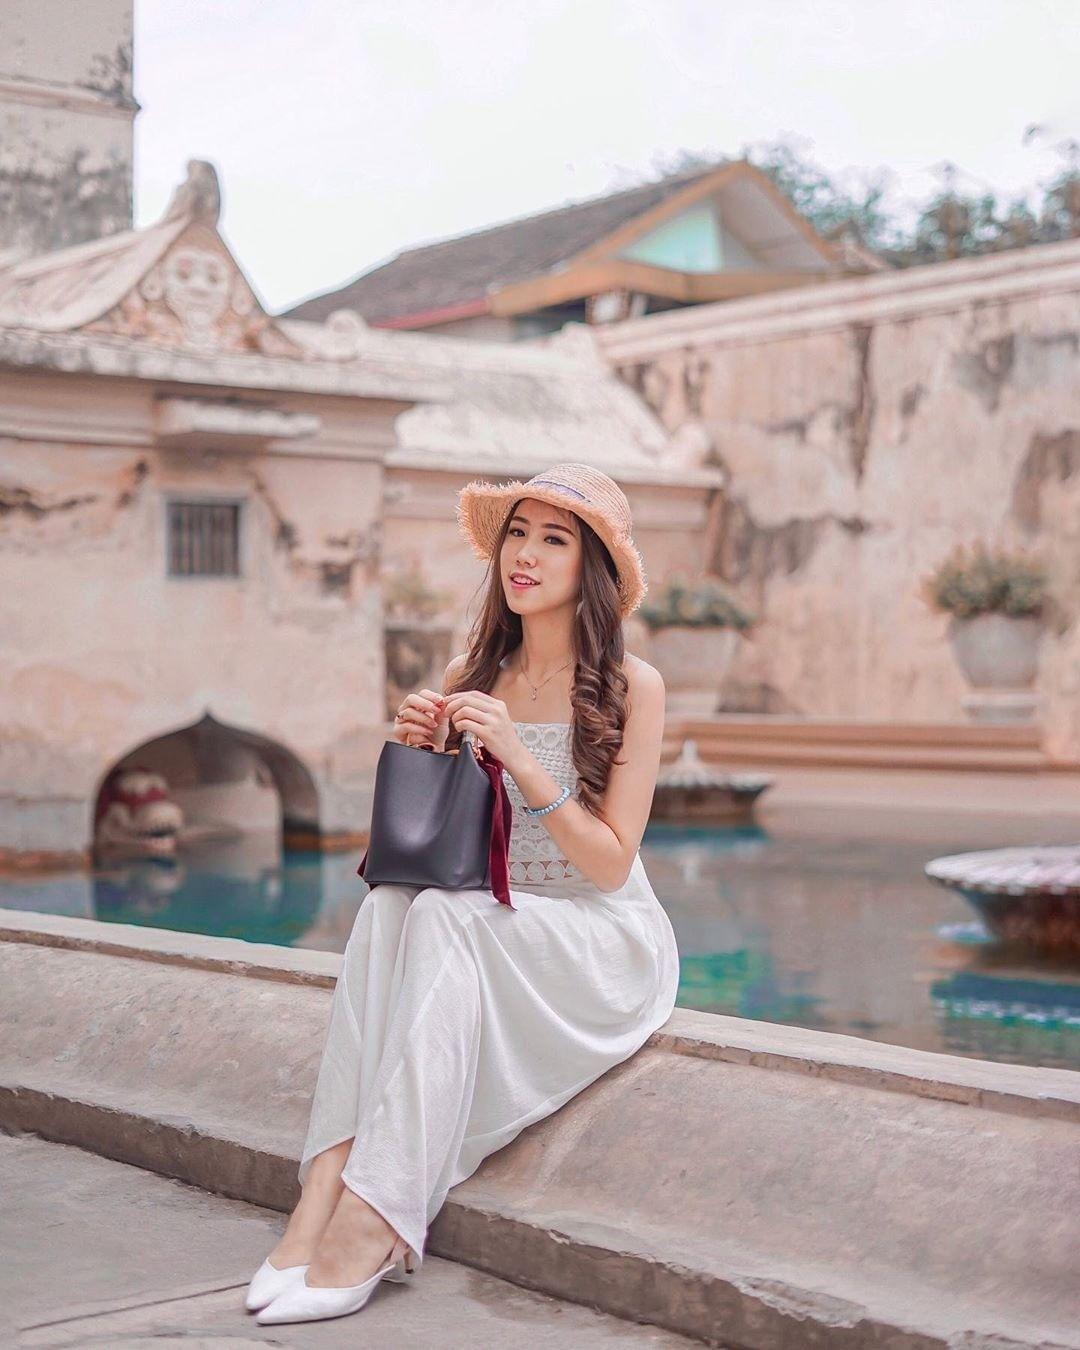 Rekomendasi Style Fashion Traveling untuk Perempuan